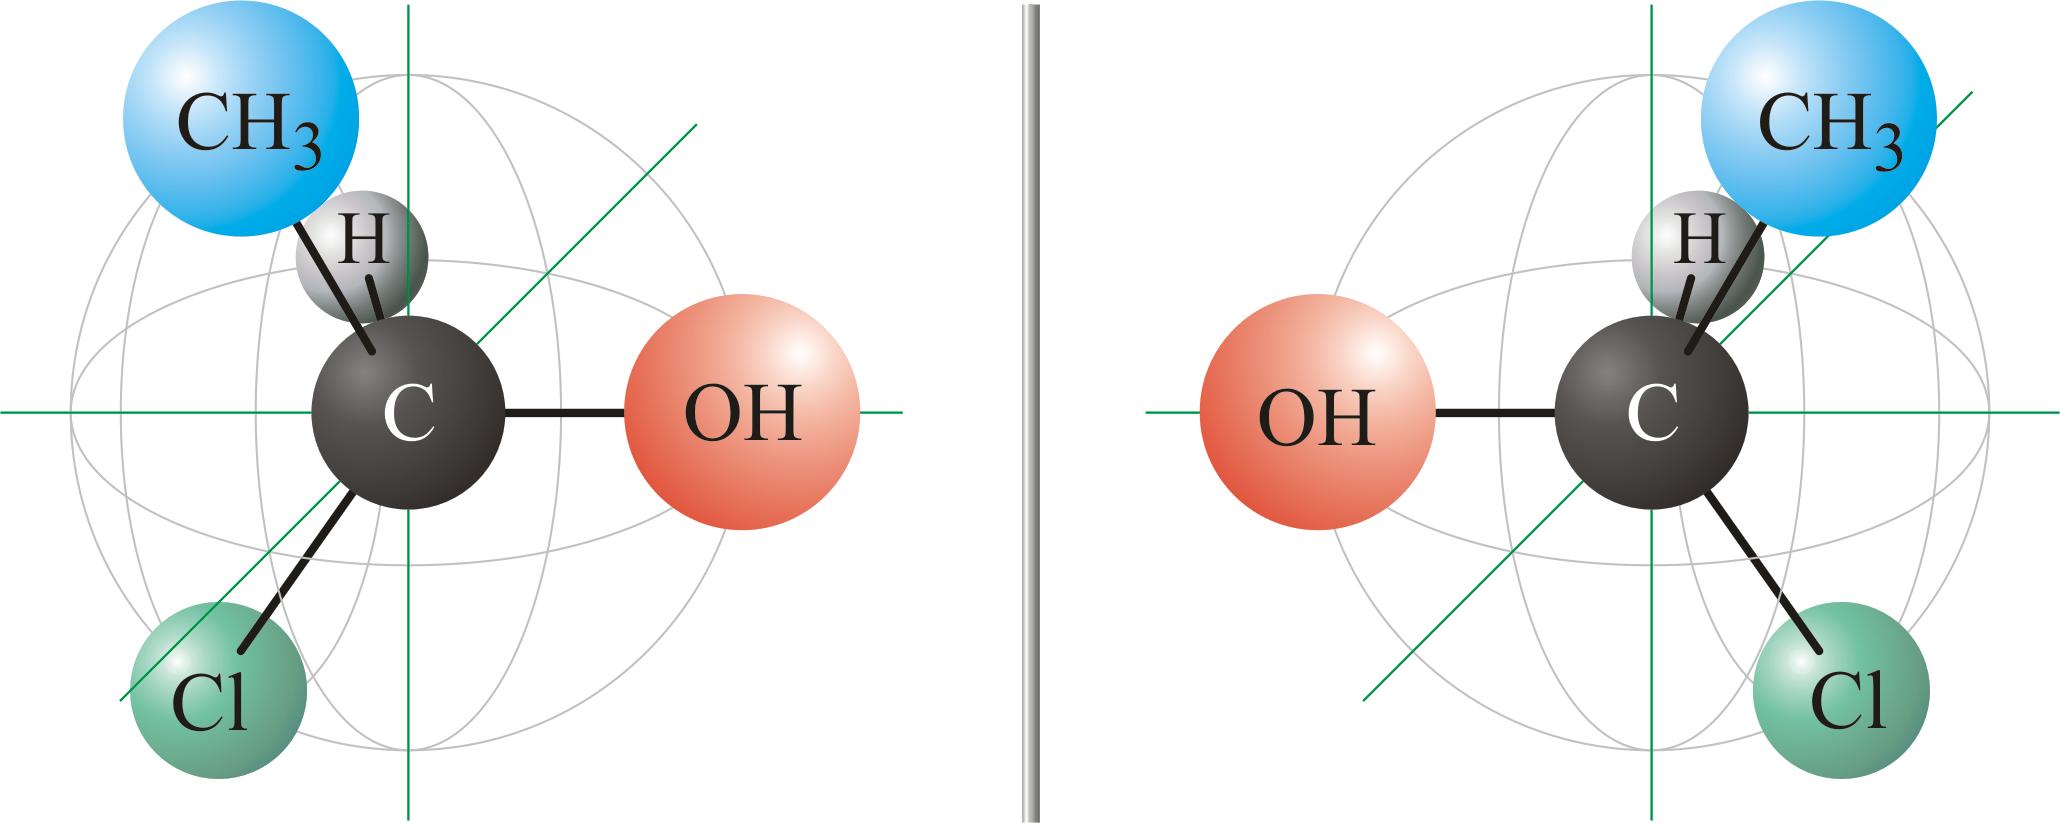 Direktni link: https://www.periodni.com/gallery/chiral_molecule.png